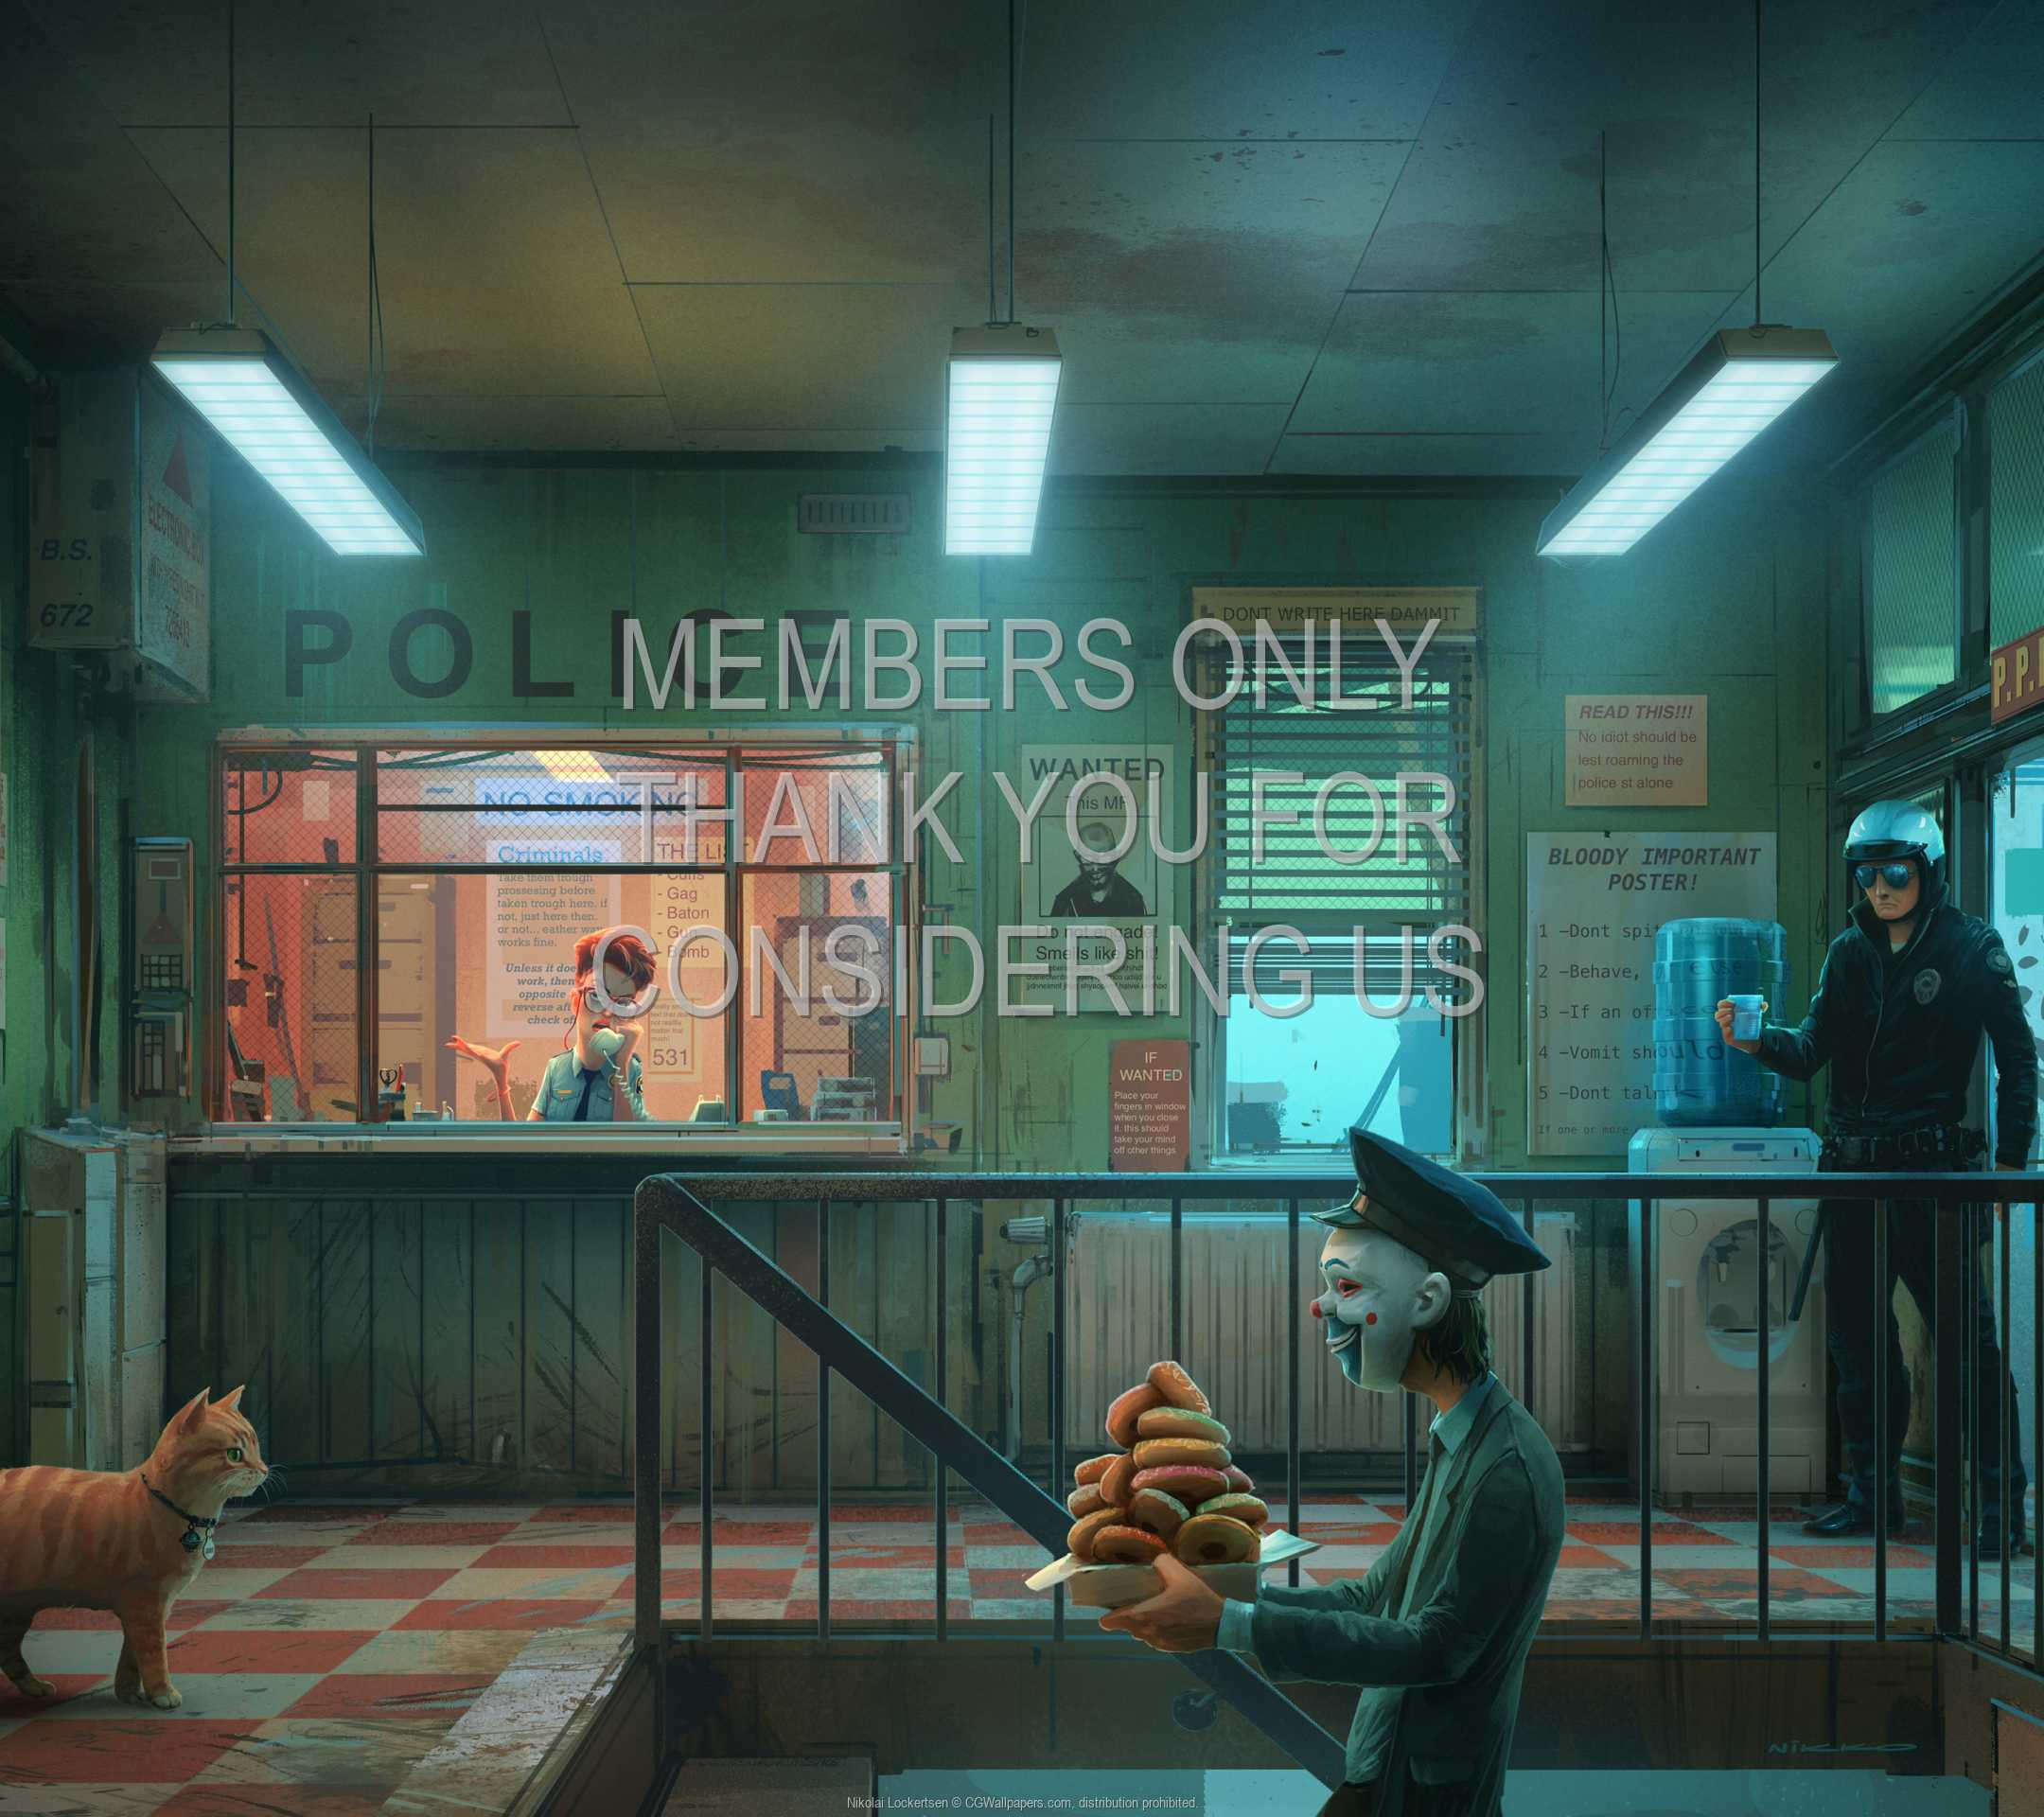 Nikolai Lockertsen 1080p Horizontal Mobile wallpaper or background 16